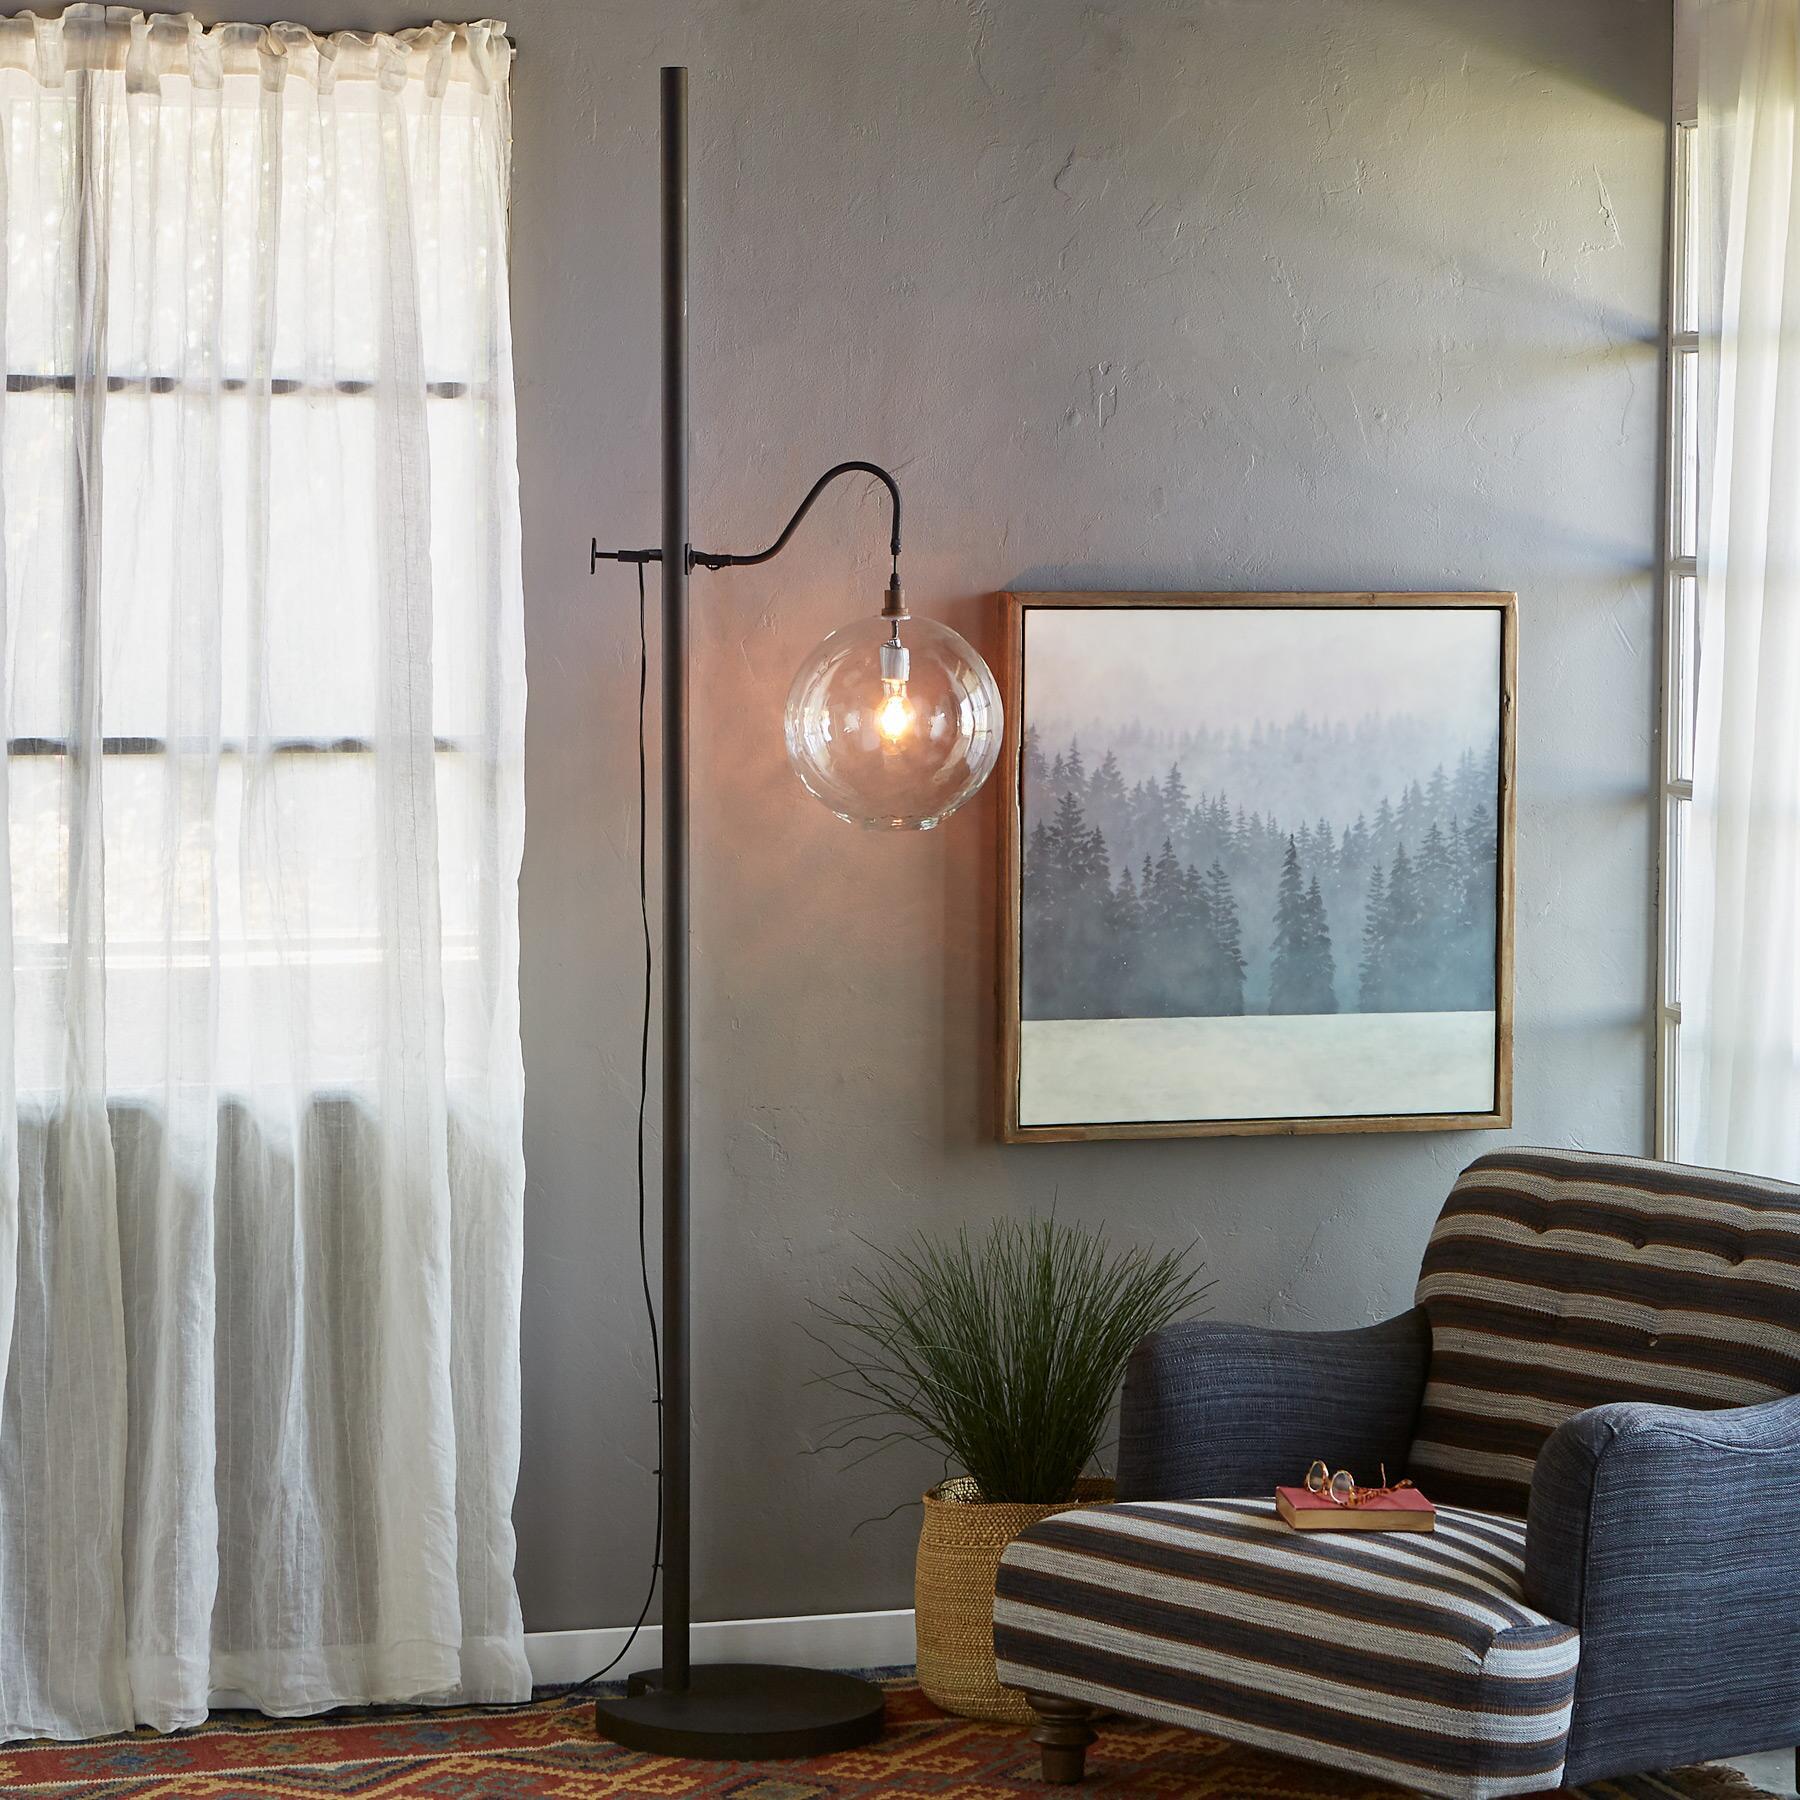 SALON GLASS FLOOR LAMP: View 2